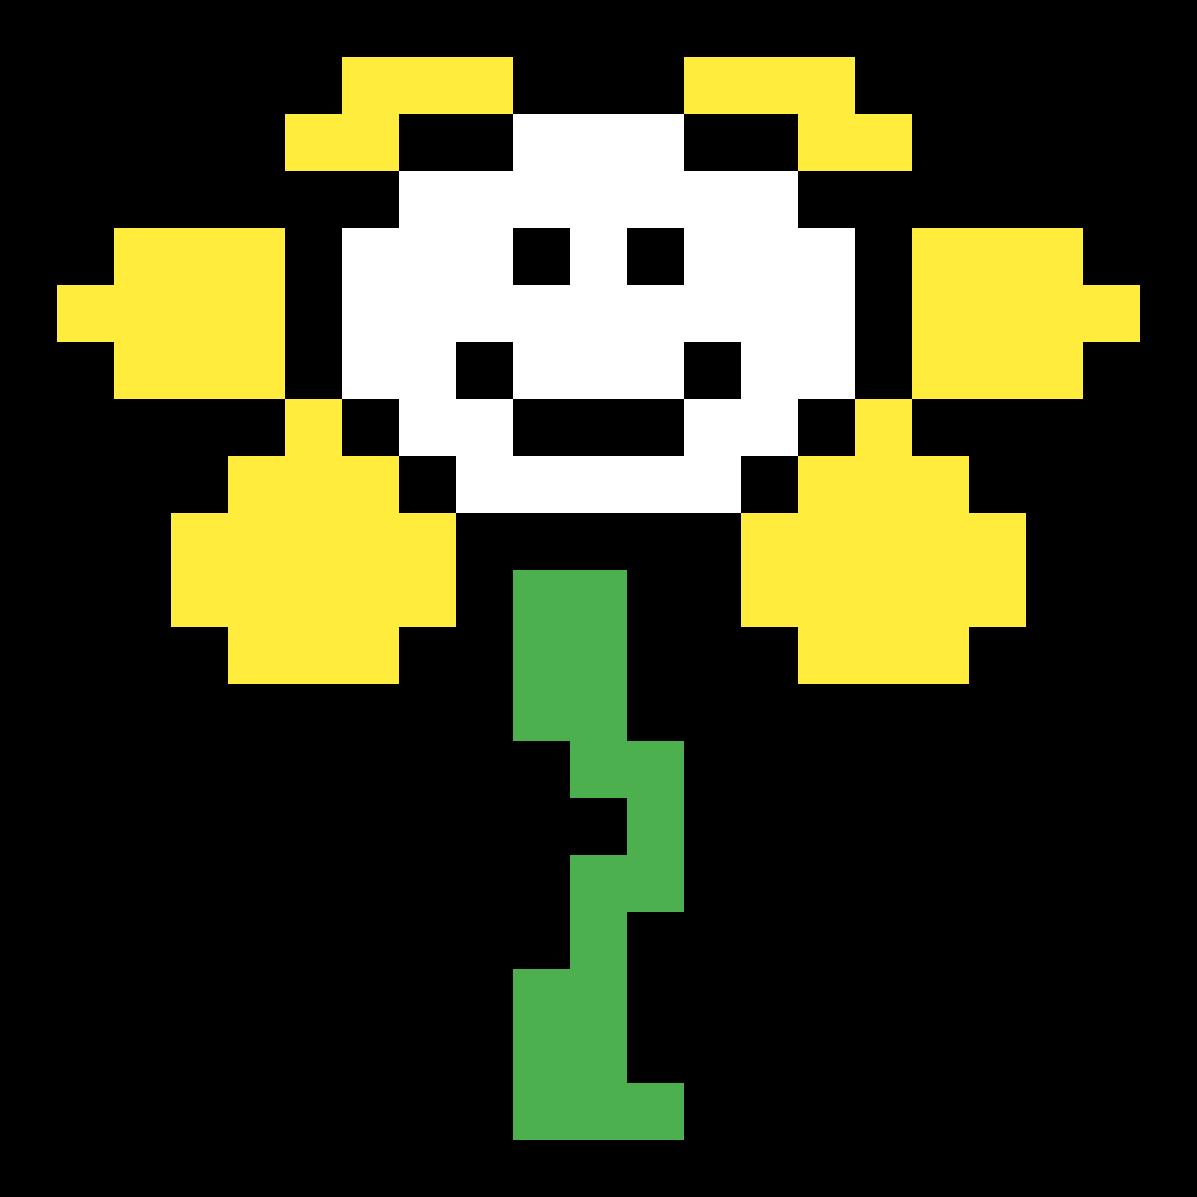 Undertale Sprite: Flowey By Daemon-chan